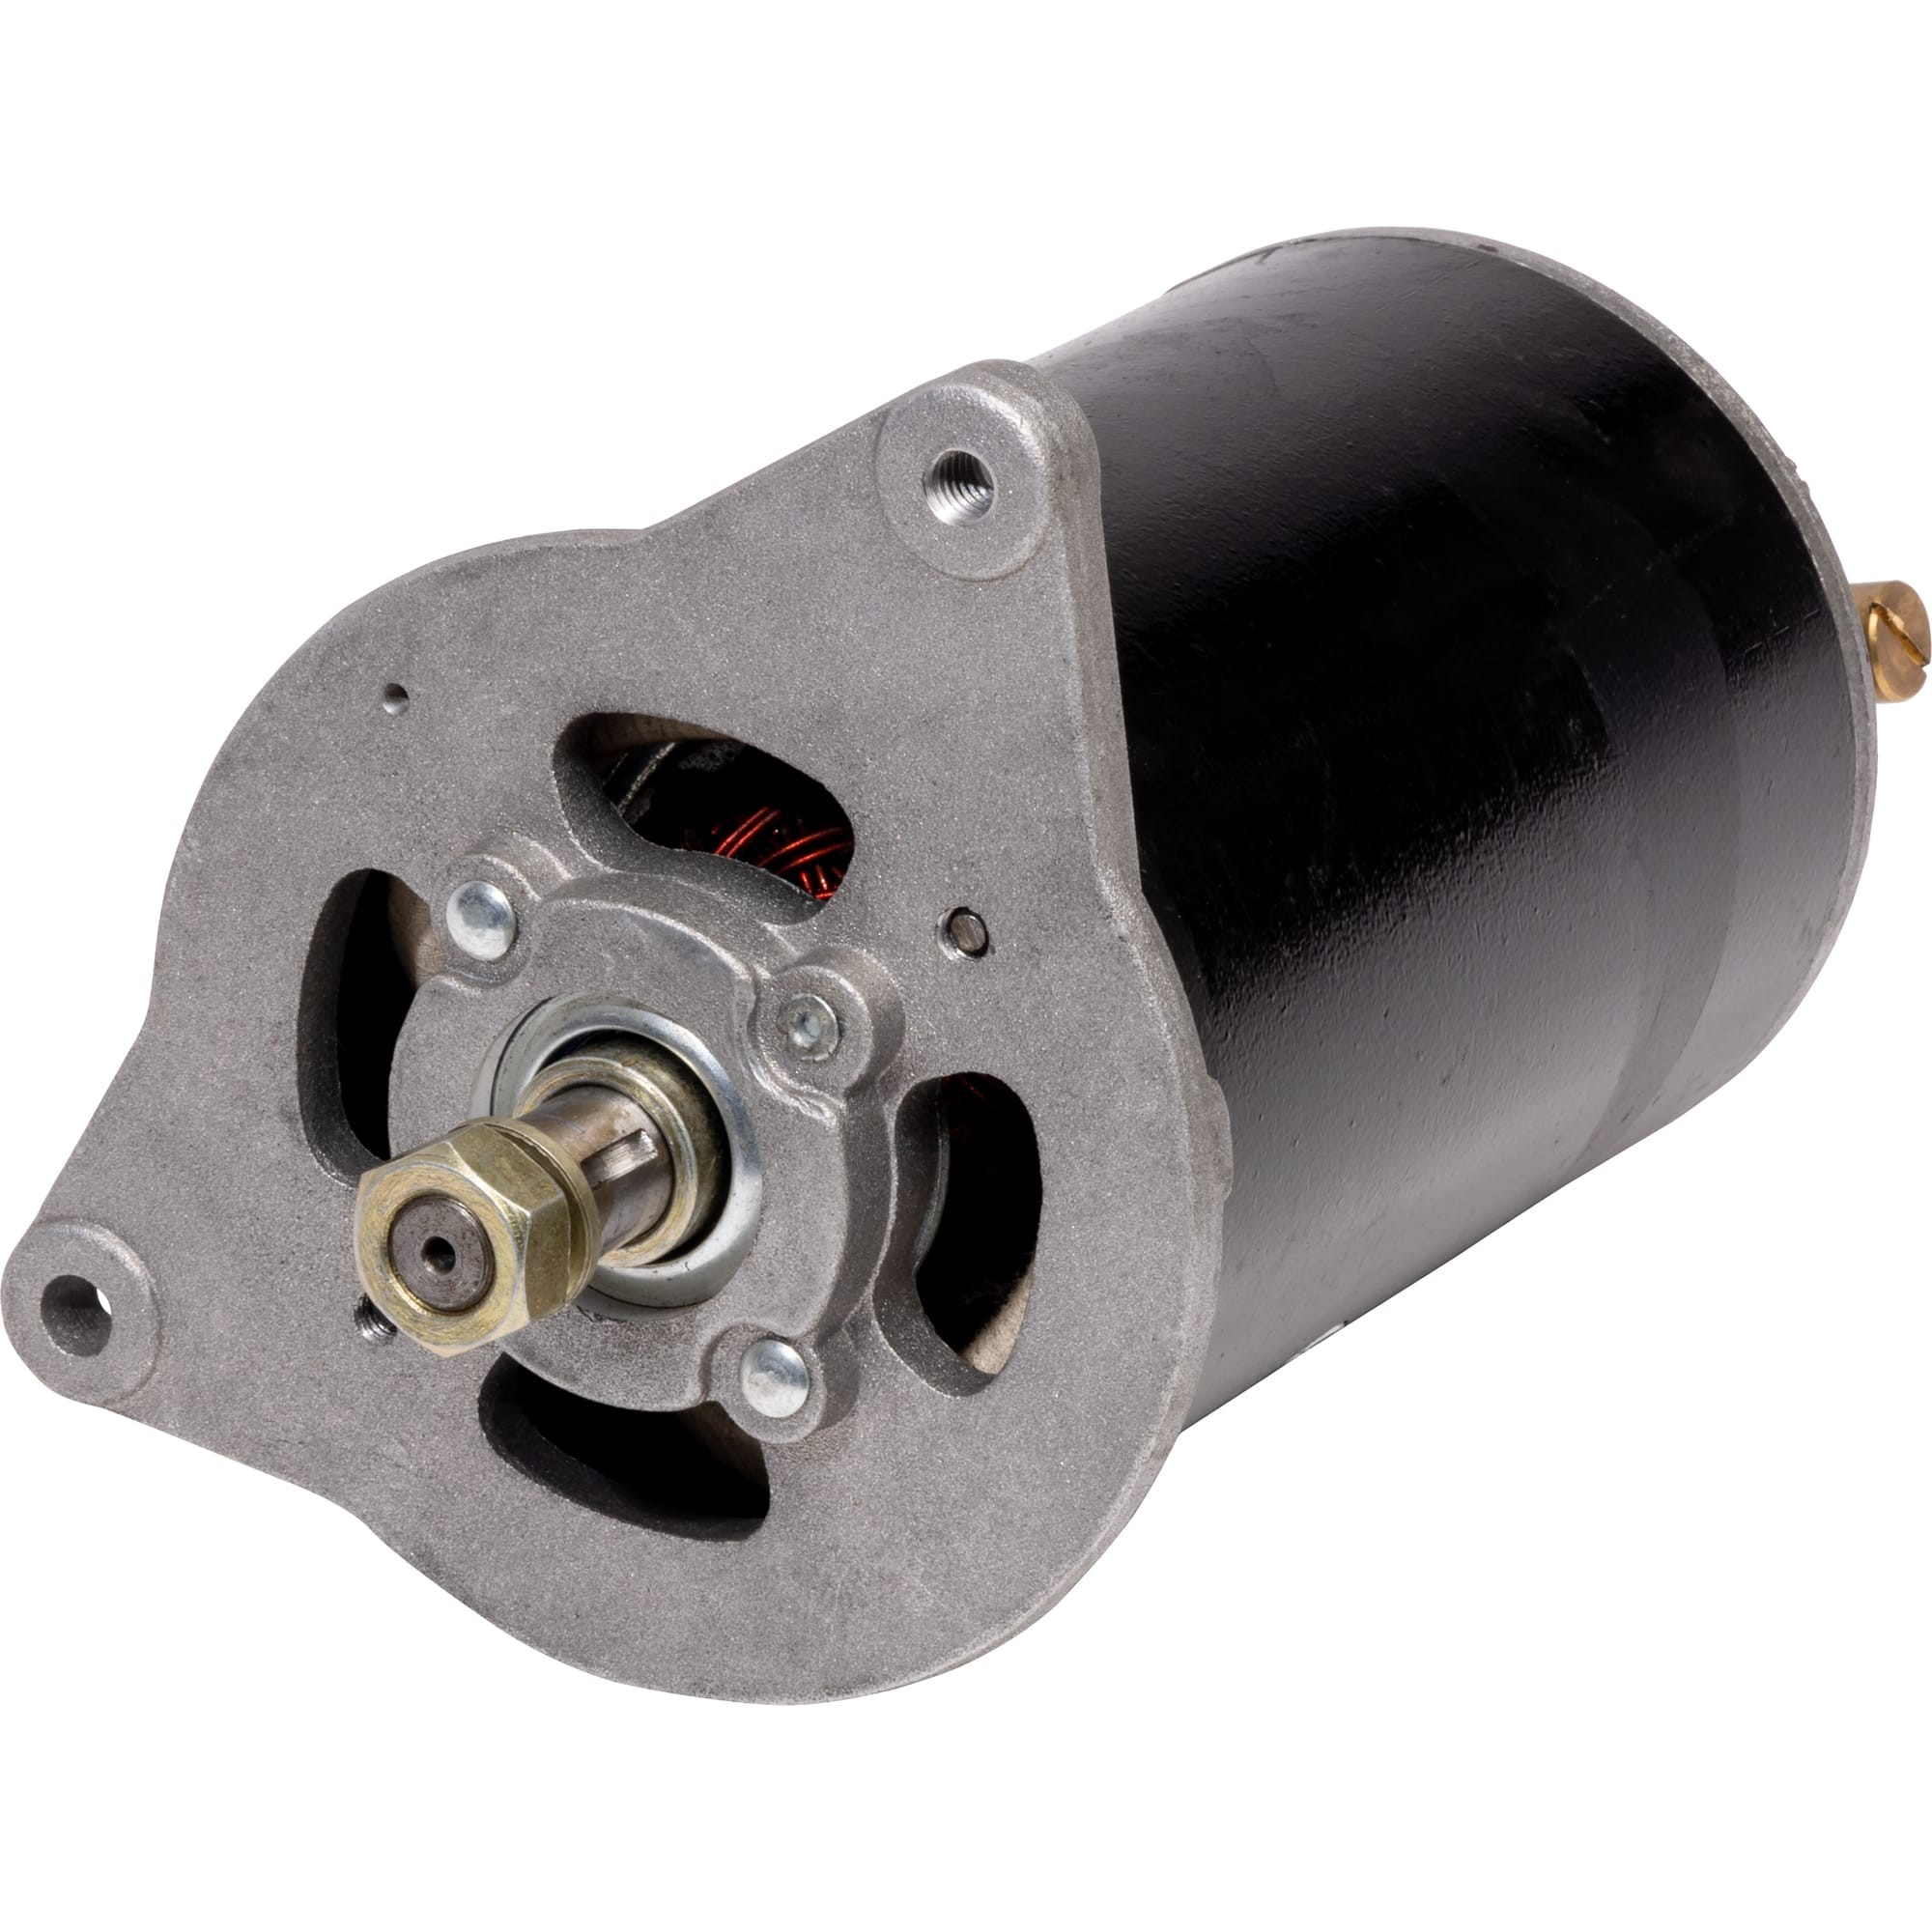 140 300 Generator New Moss Motors